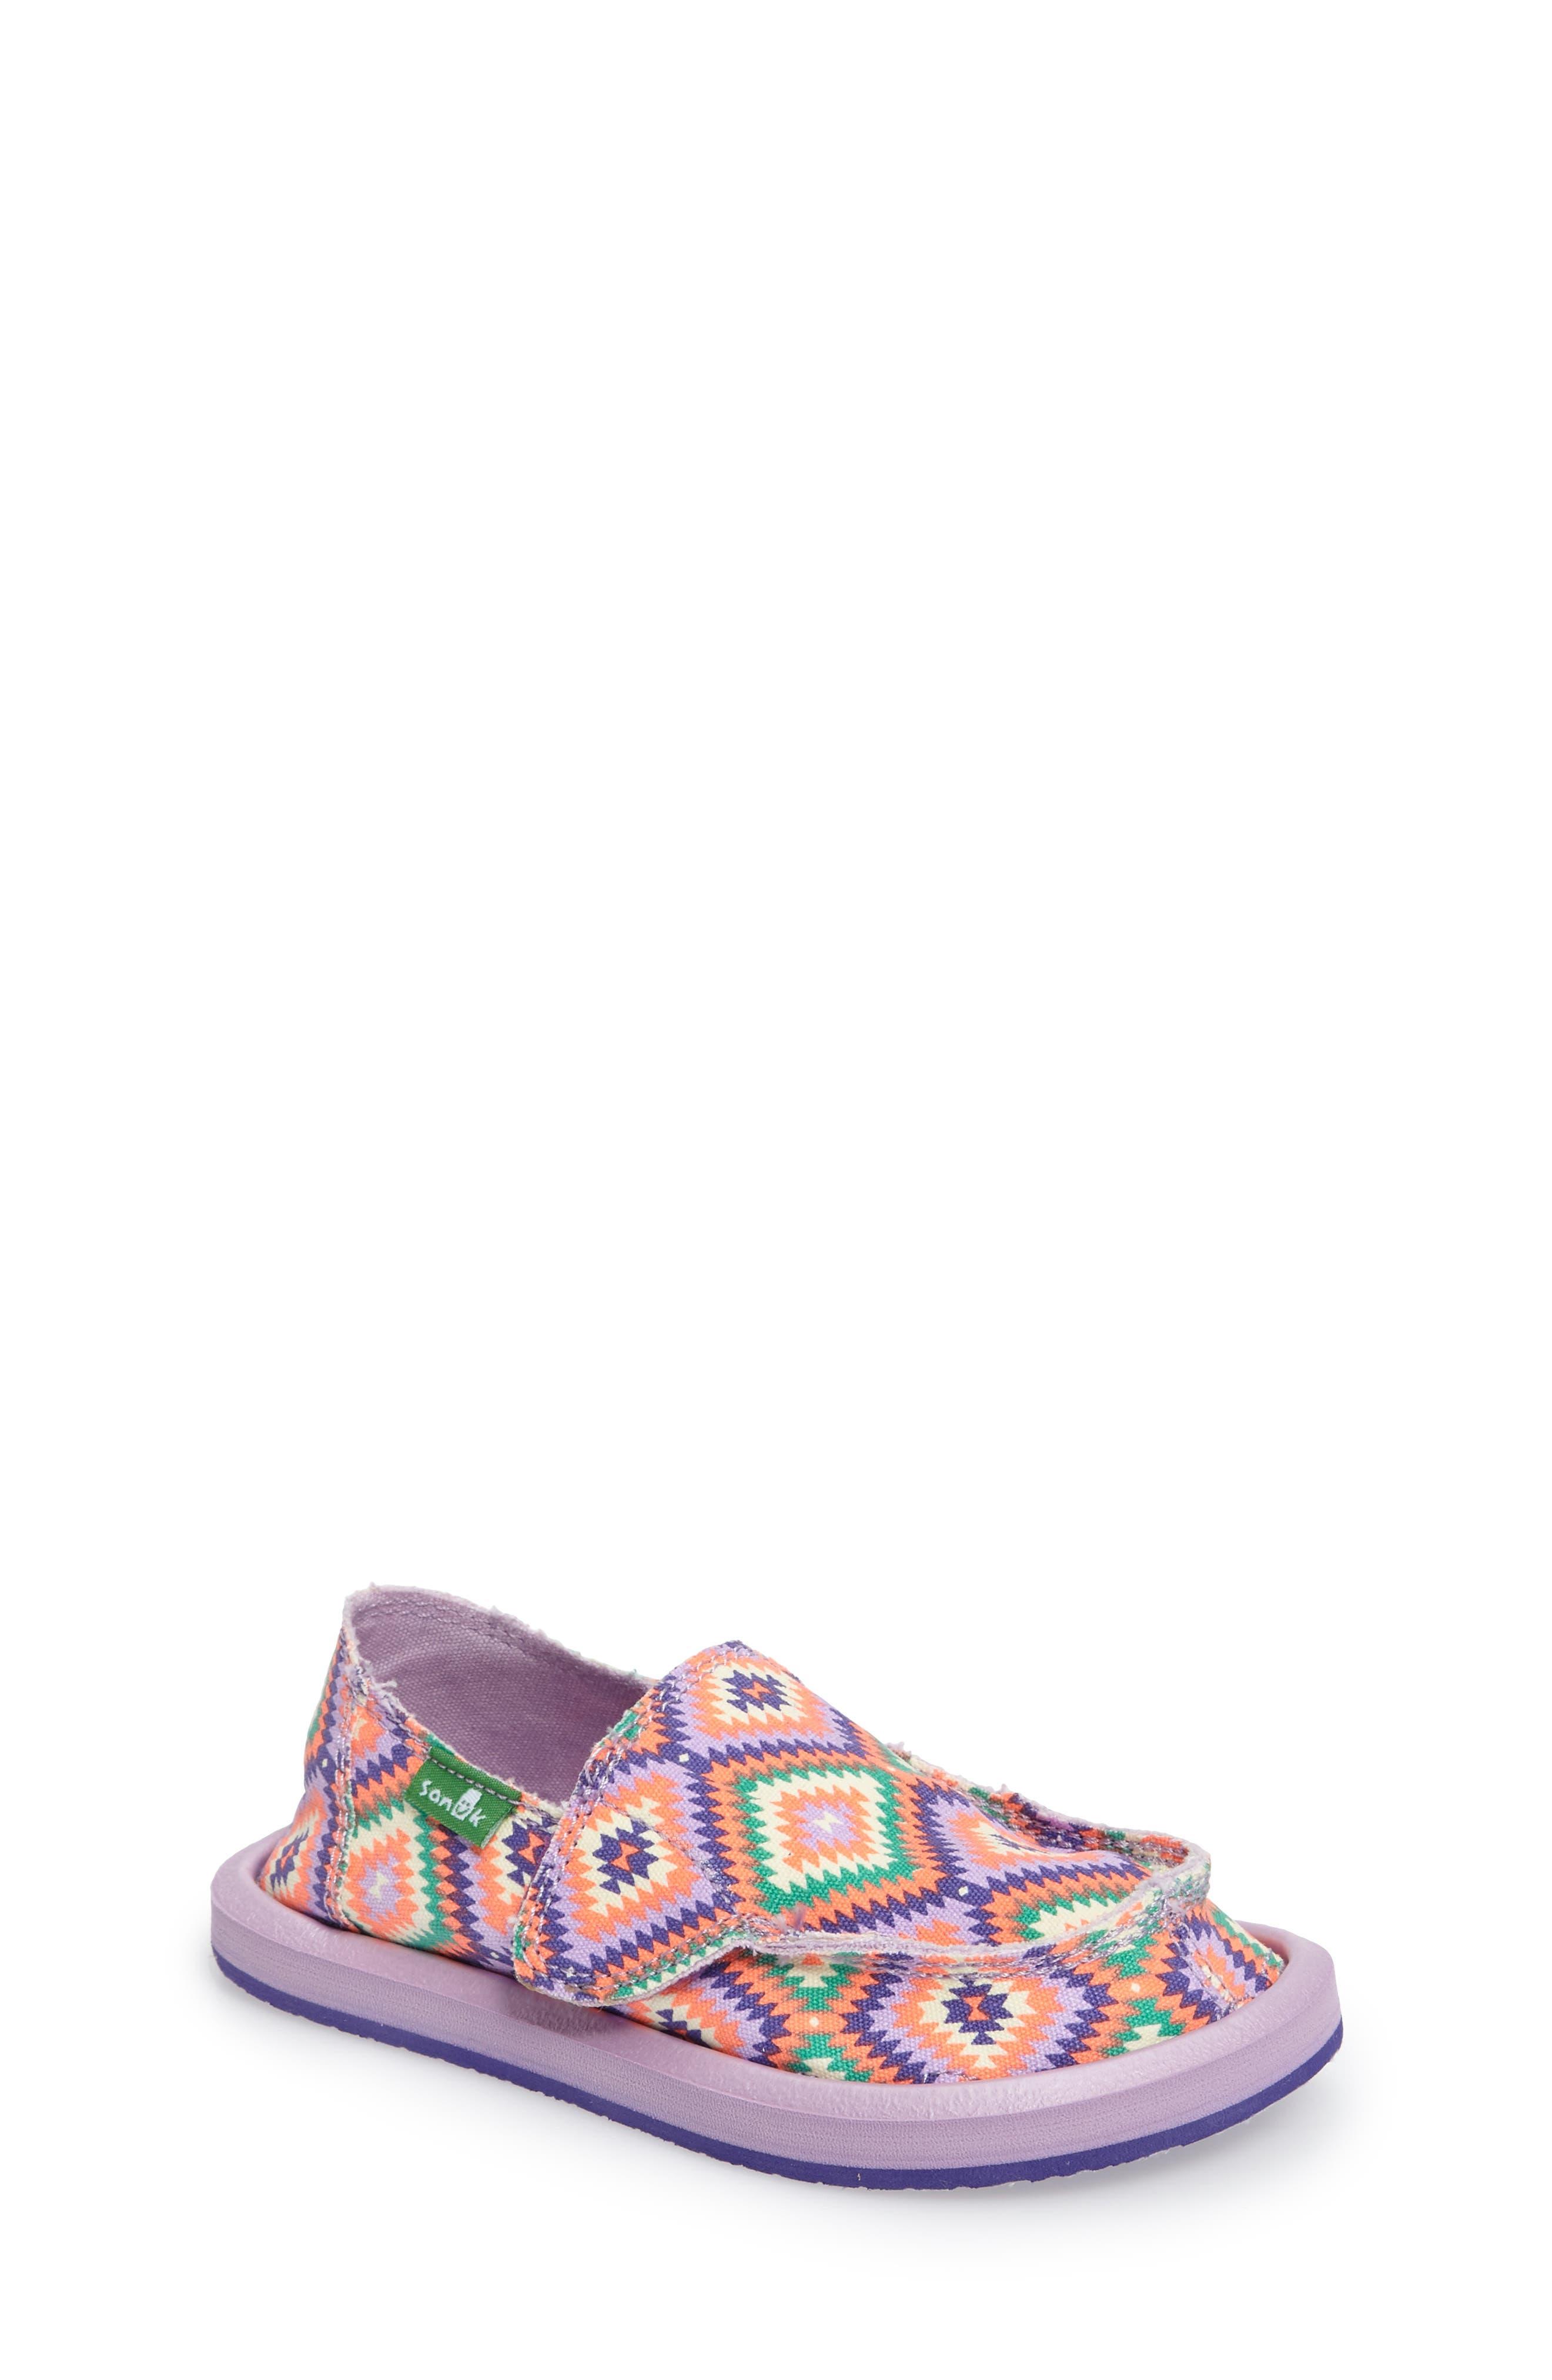 Donna Slip-On Sneaker,                             Main thumbnail 1, color,                             556